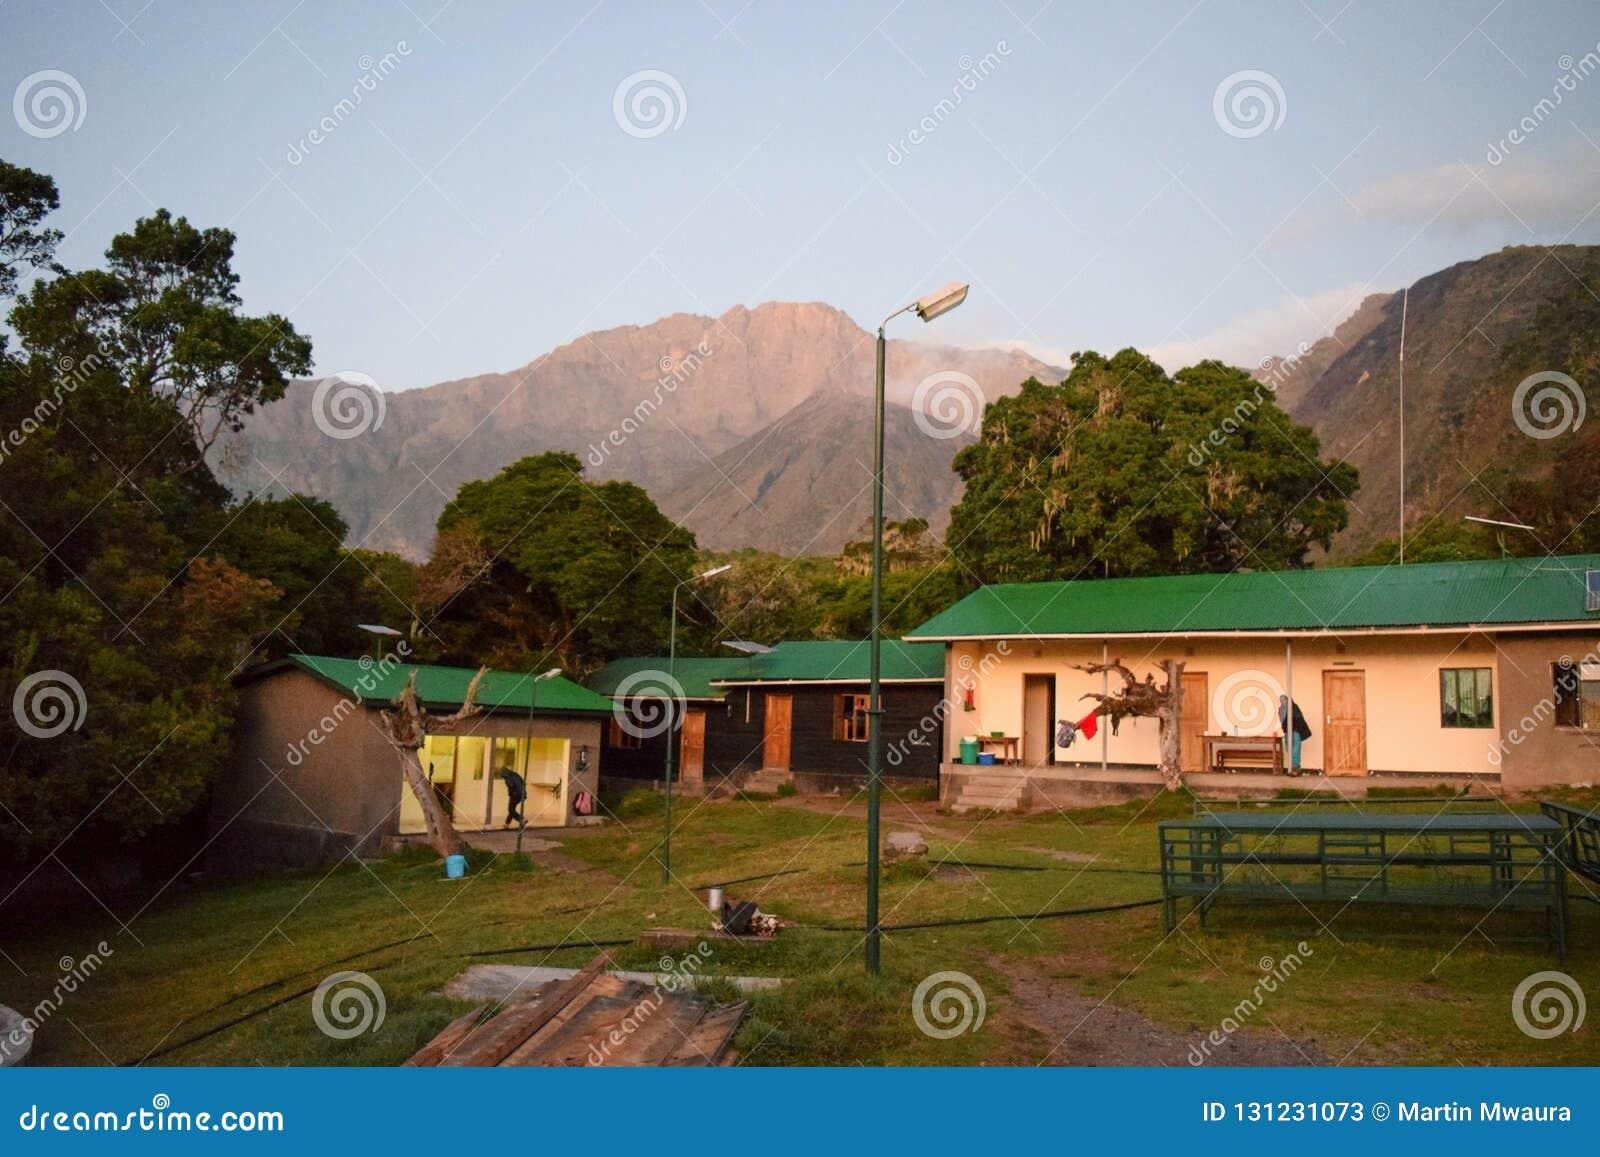 Miriakamba Hut, Mount Meru, Arusha National Park, Tanzania